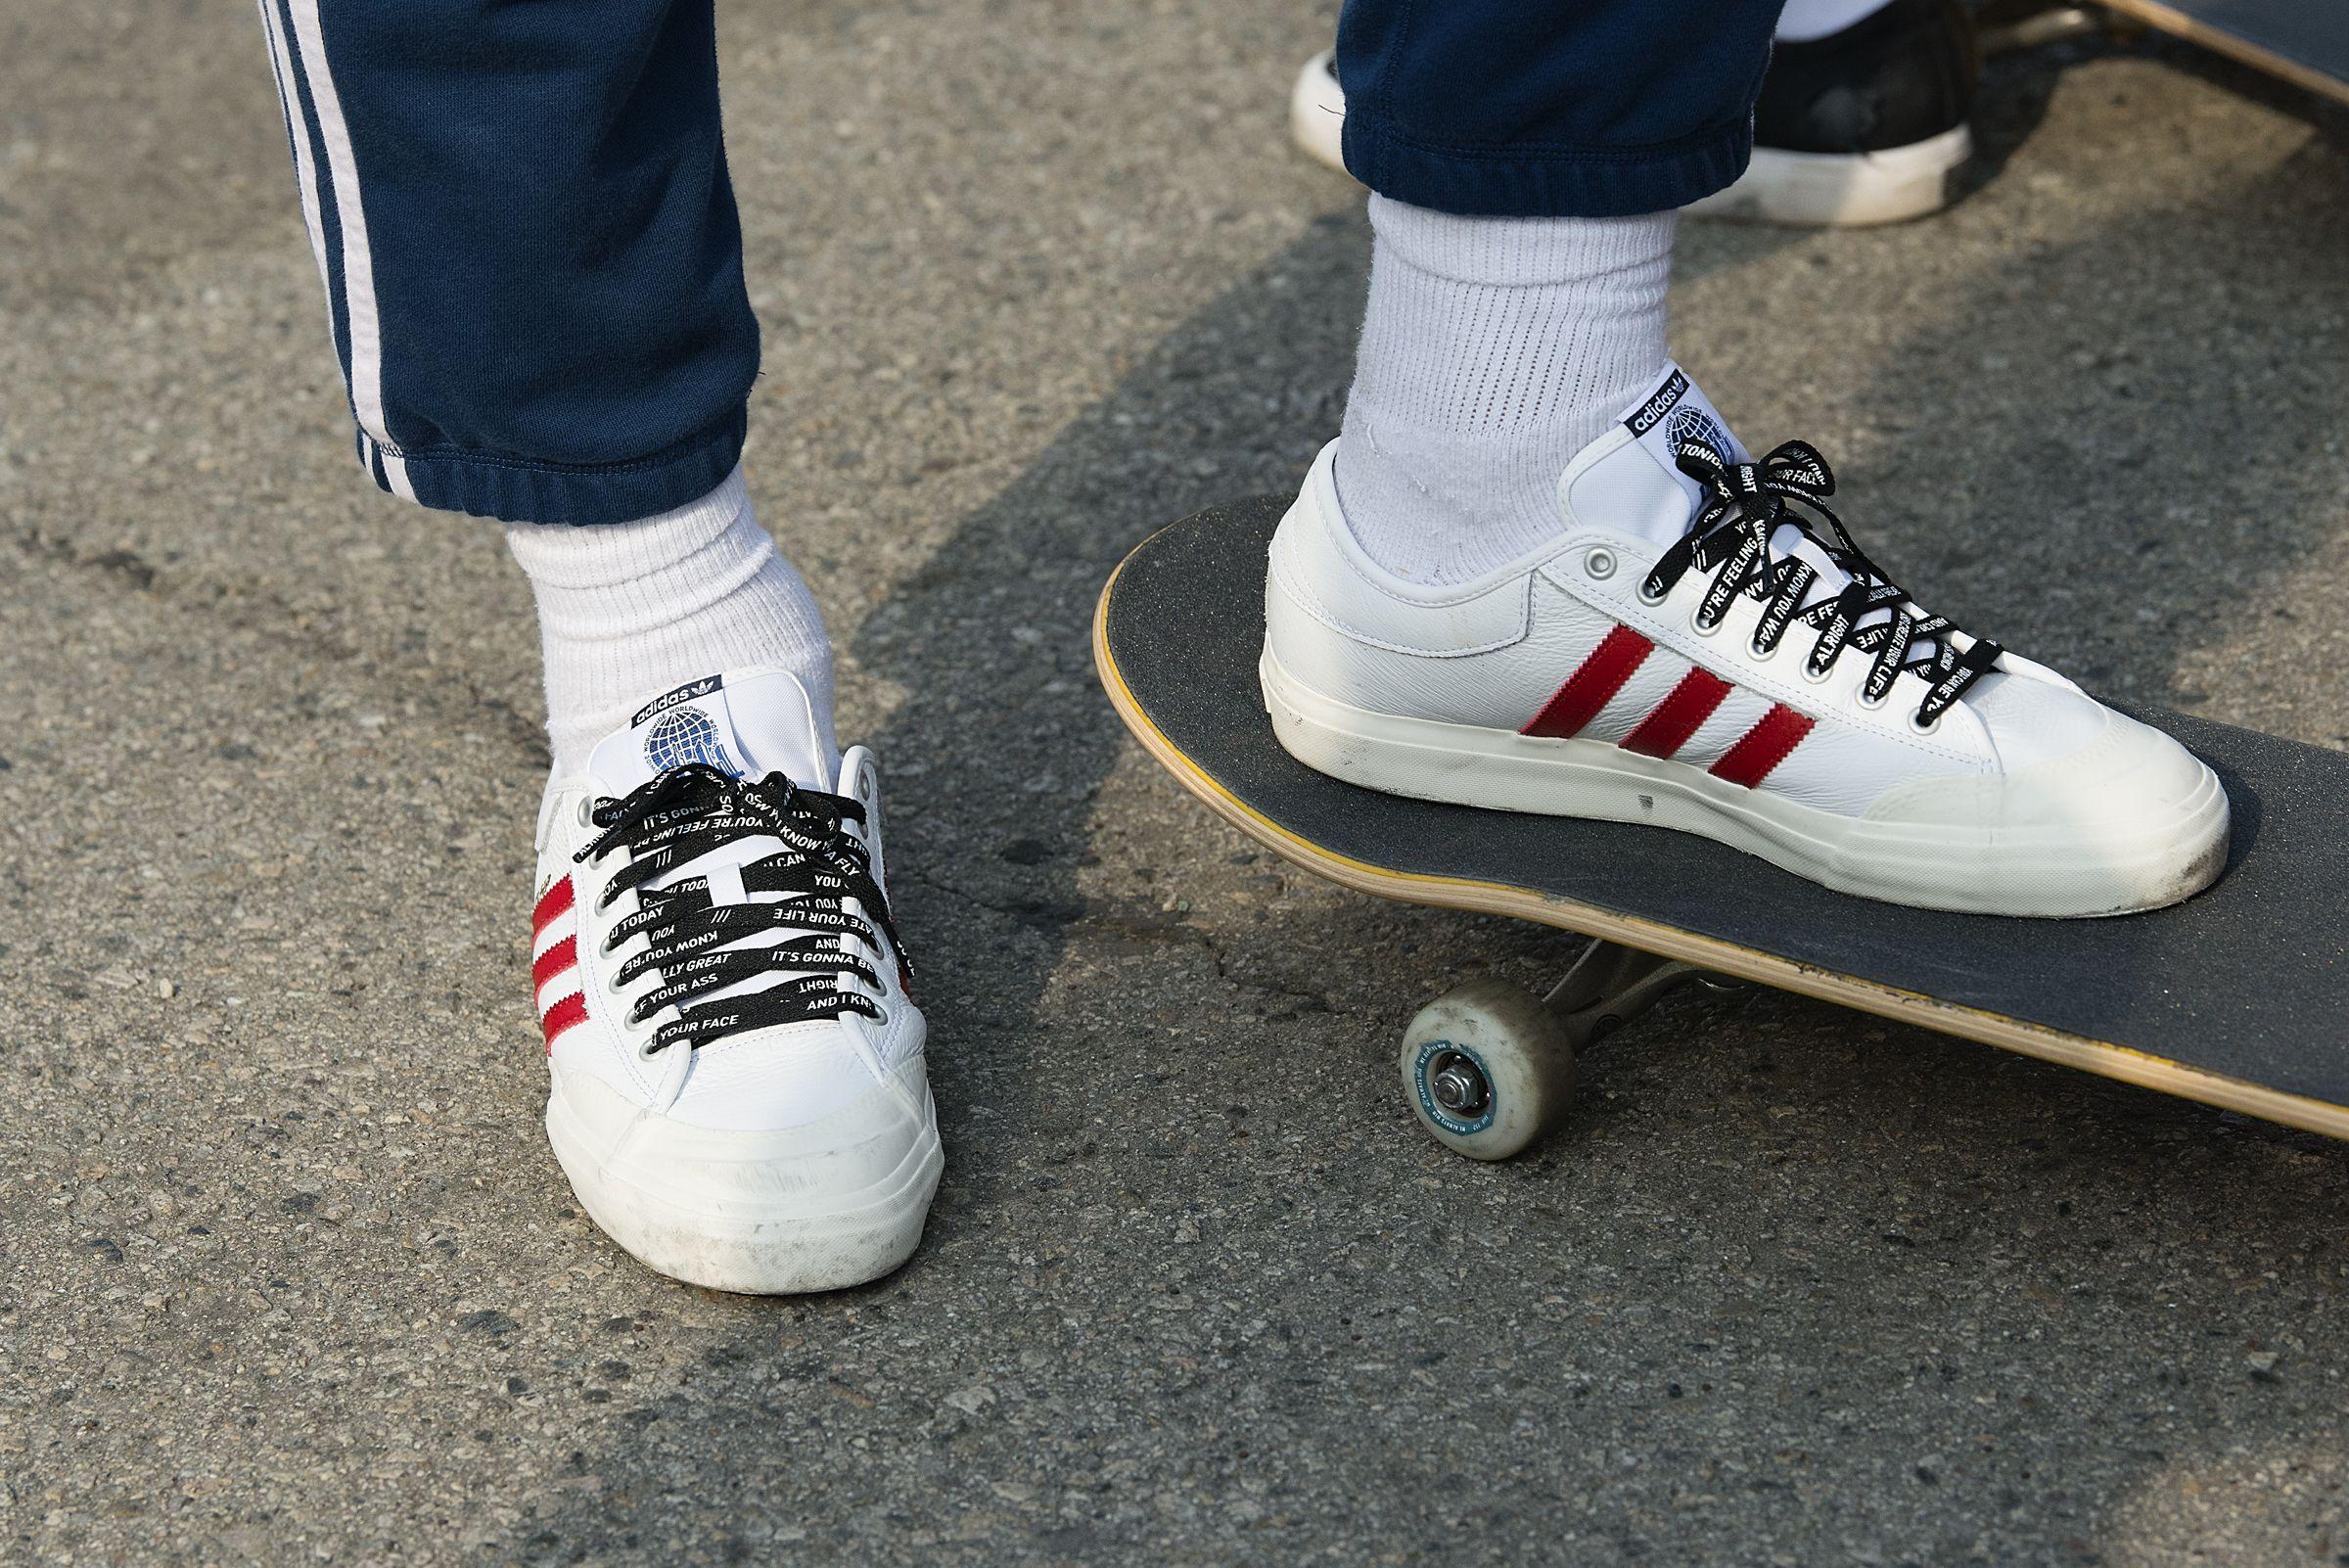 hilo Horno Destello  Images Of The adidas Skateboarding x A$AP Ferg Trap Lord Launch Party +  Skate Copa Court • KicksOnFire.com | Adidas skateboarding, Adidas,  Skateboard